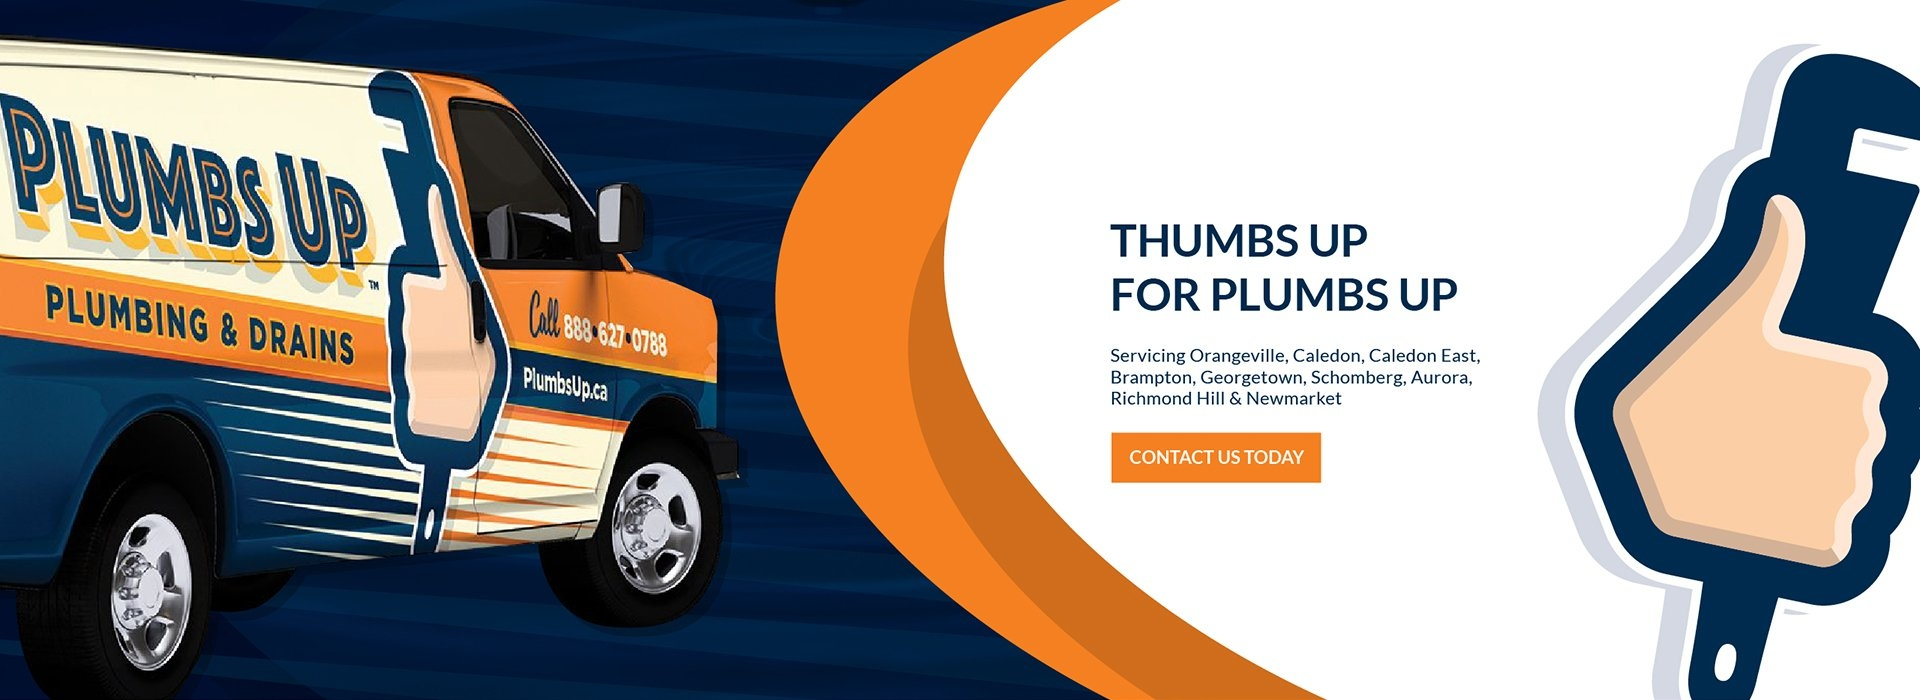 Plumbs Up Plumbing & Drains (@plumbsup) Cover Image